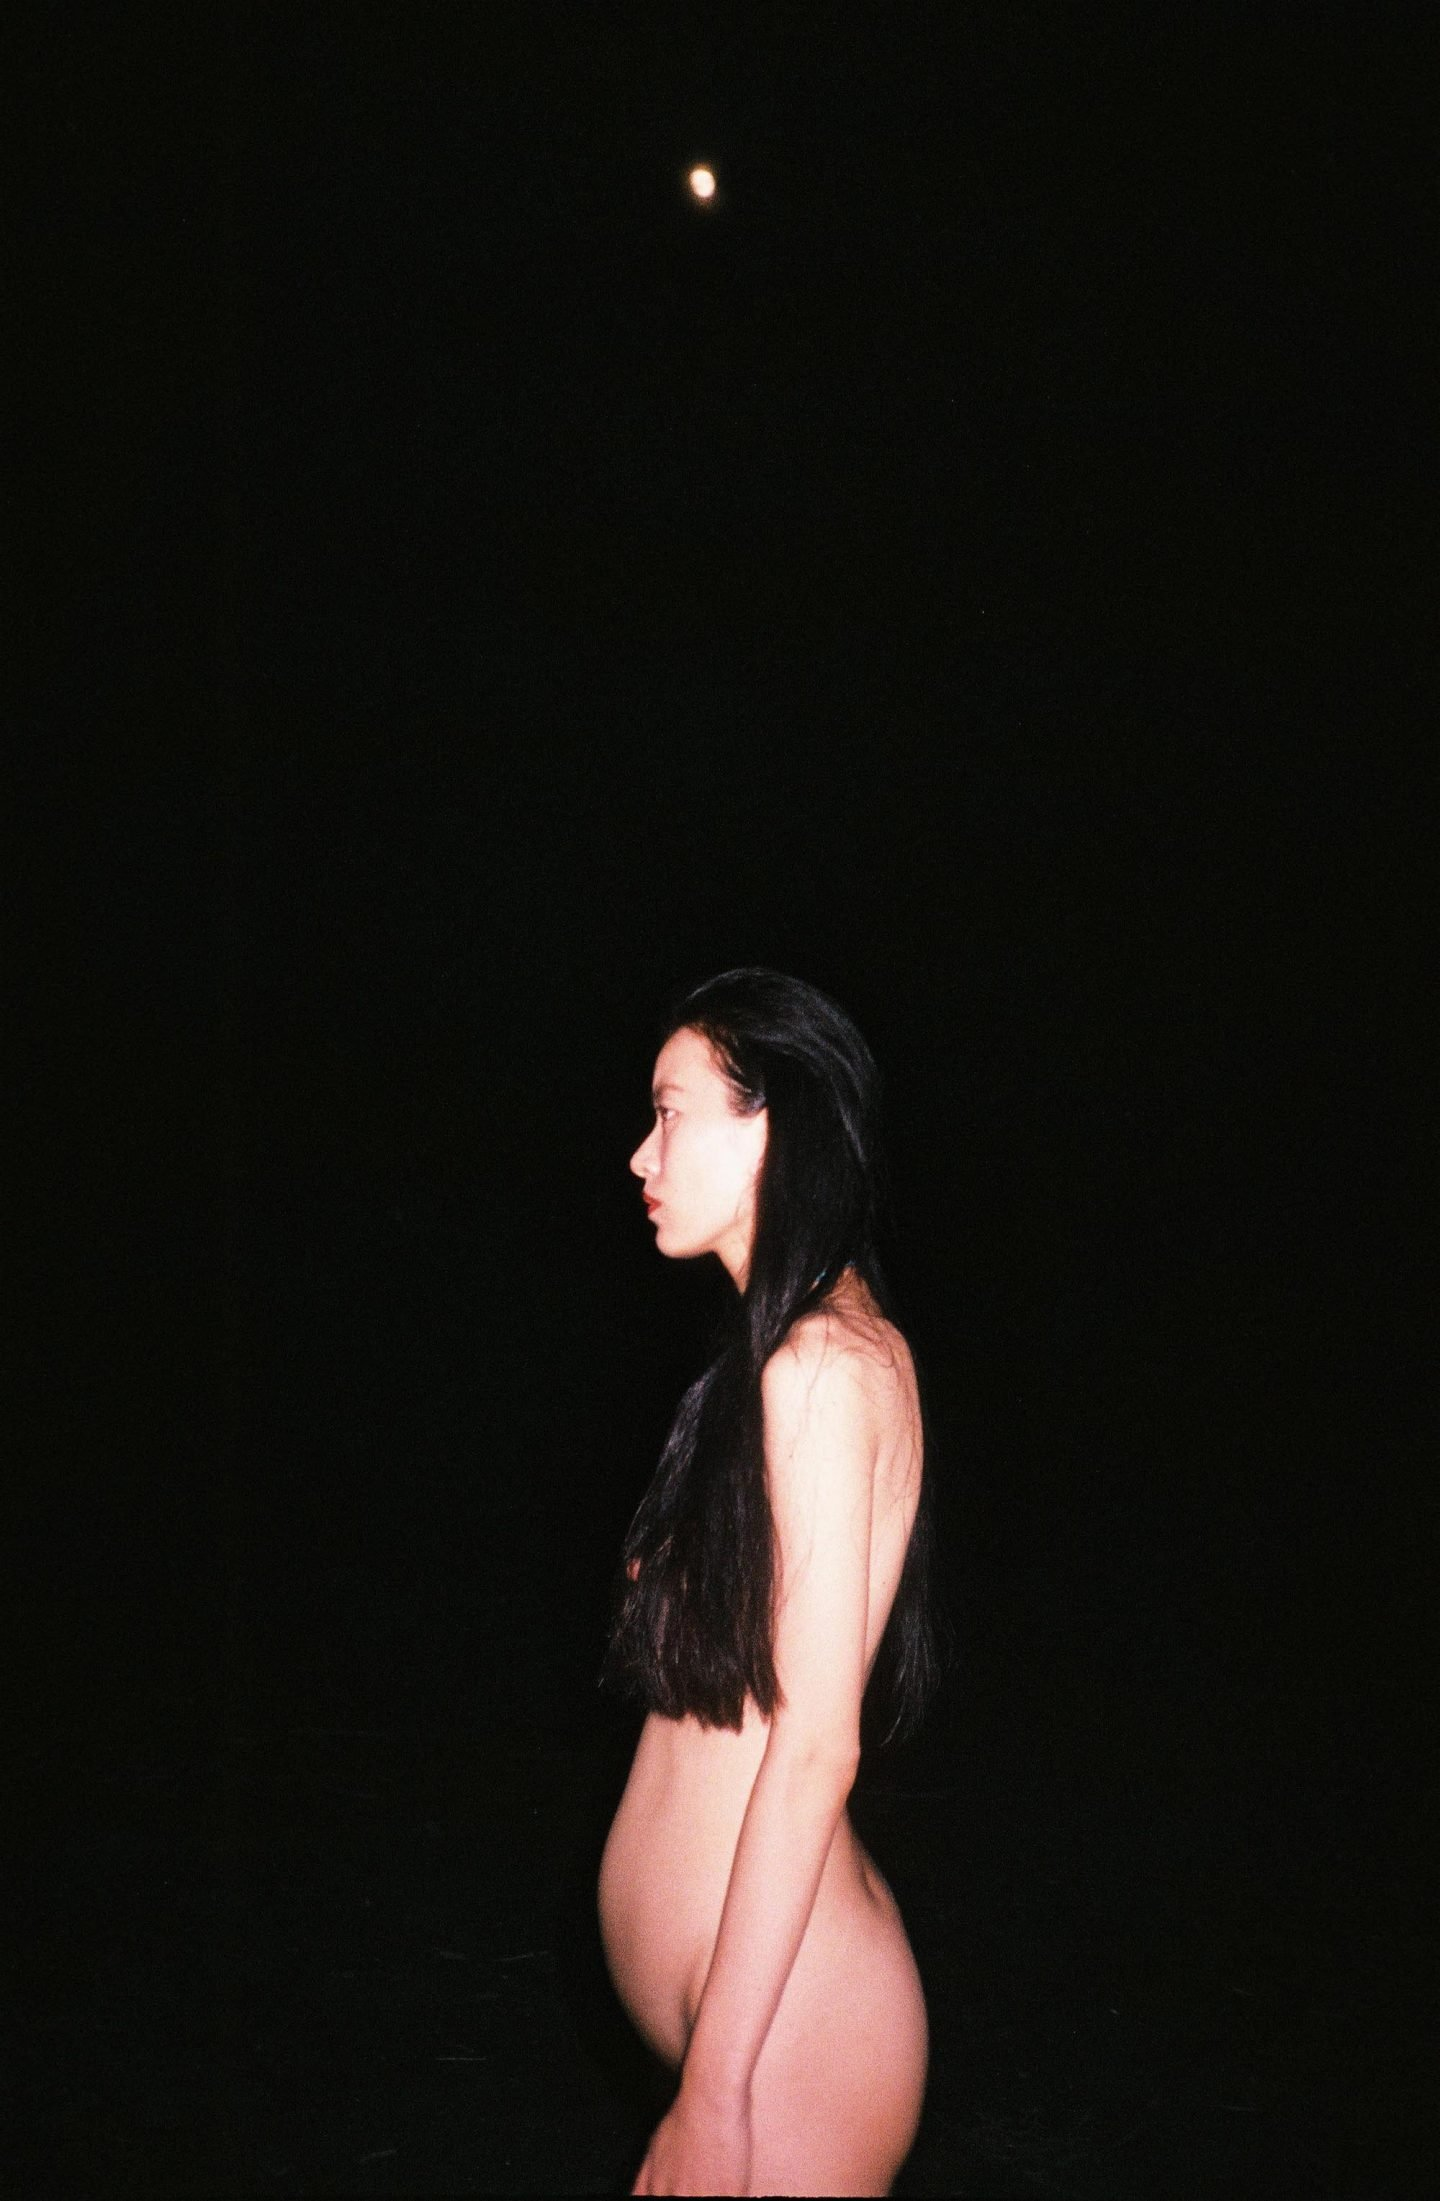 iGNANT-Photography-Yuan-Yao-Nami-B3